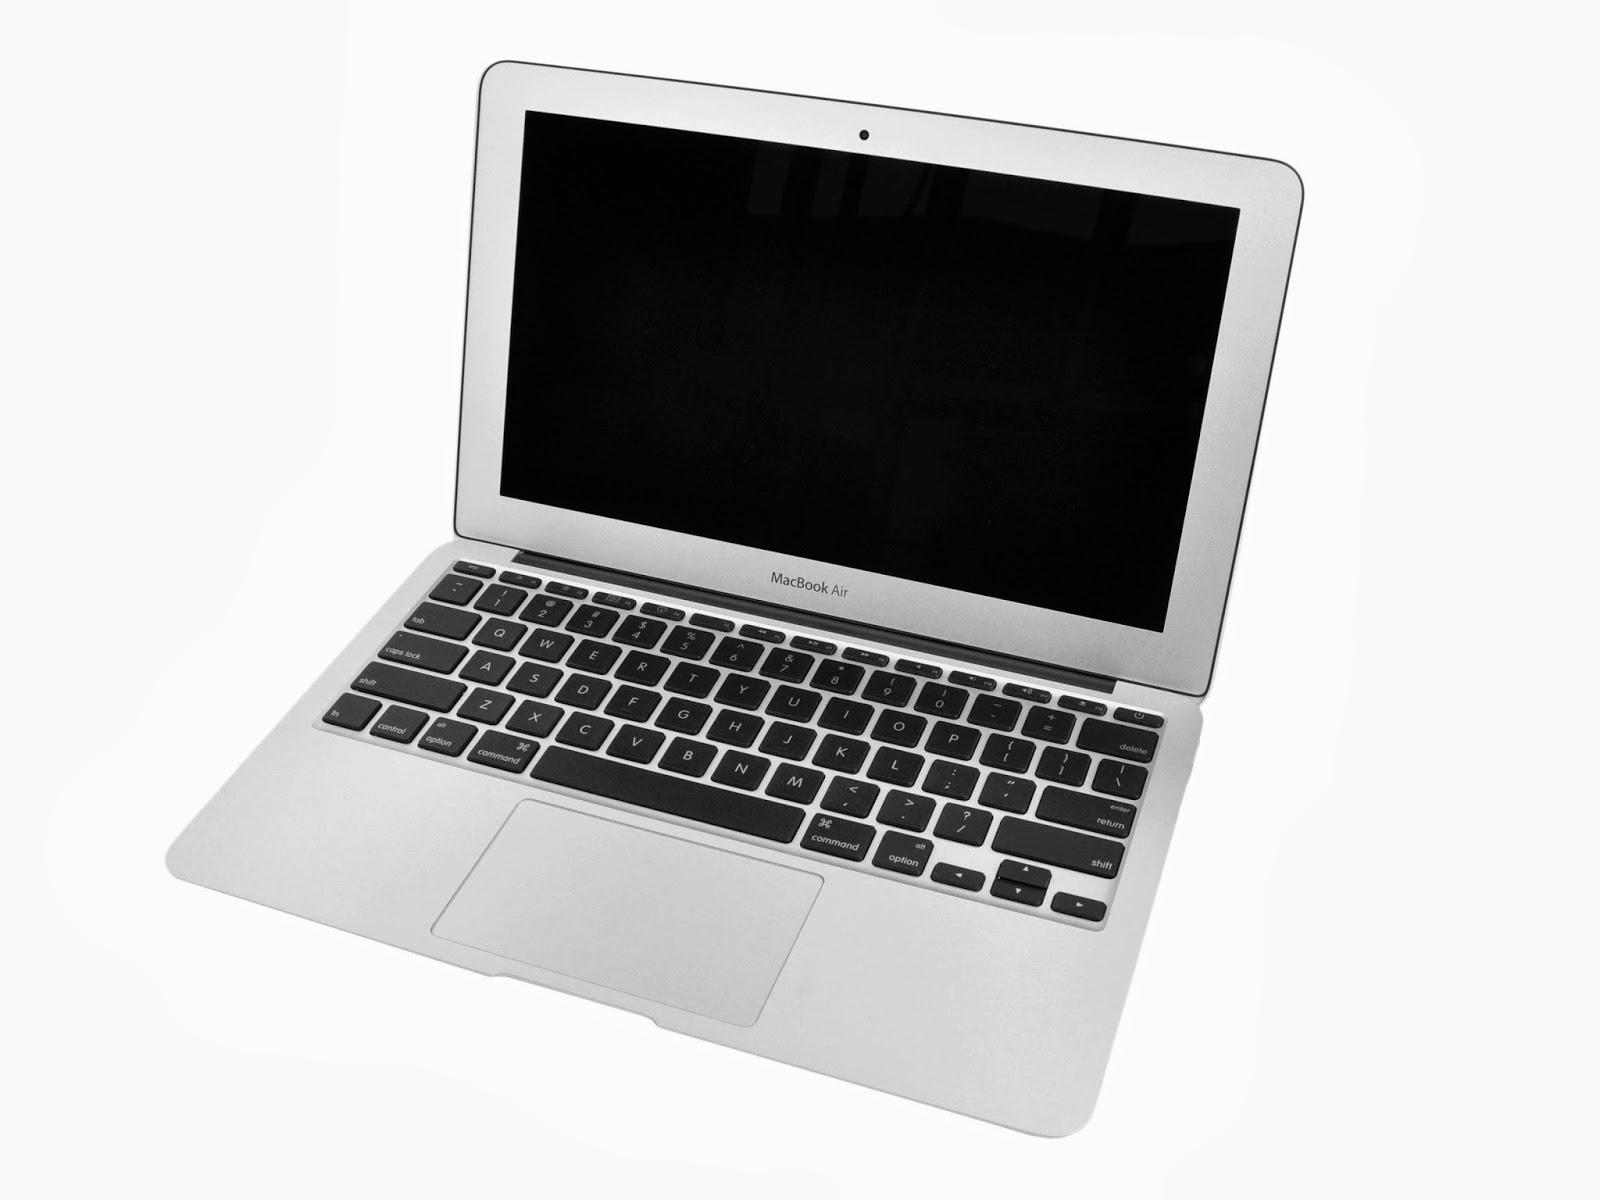 apple macbook air a1370 mlb k78 macbook air. Black Bedroom Furniture Sets. Home Design Ideas